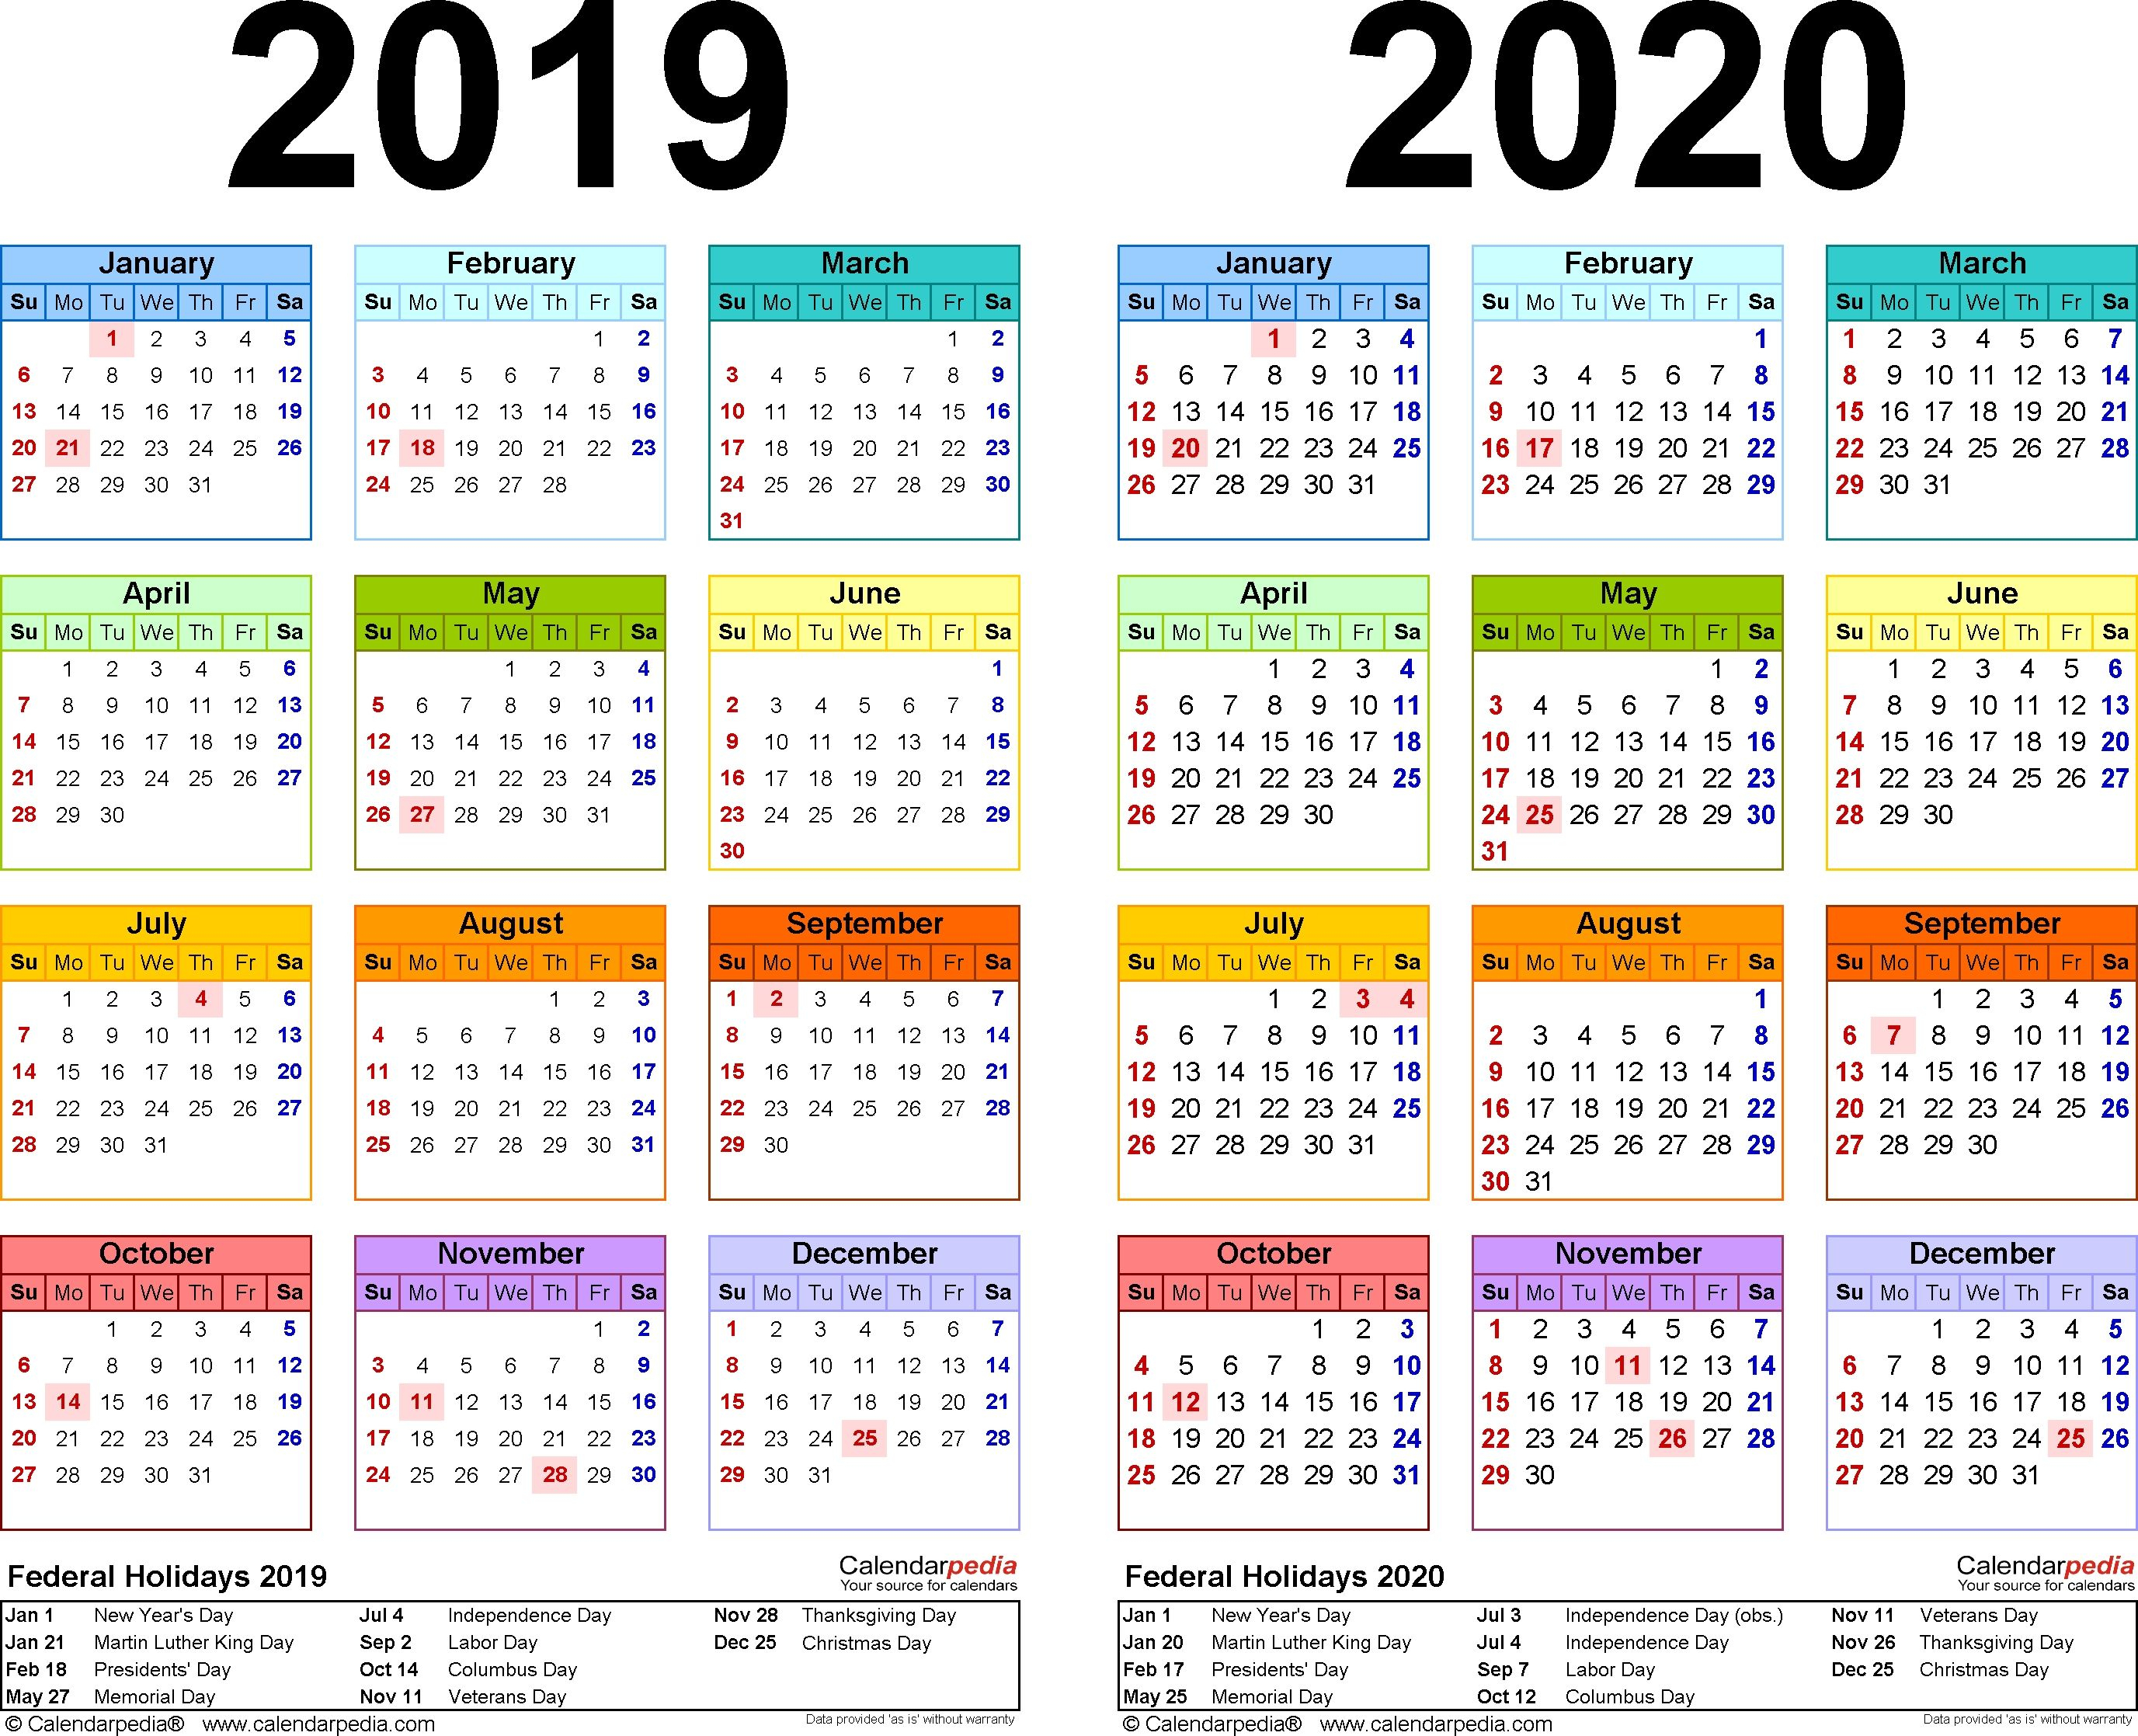 2019-2020 Calendar - Free Printable Two-Year Excel Calendars 2020 throughout Google Calendar Printable 2019 2020